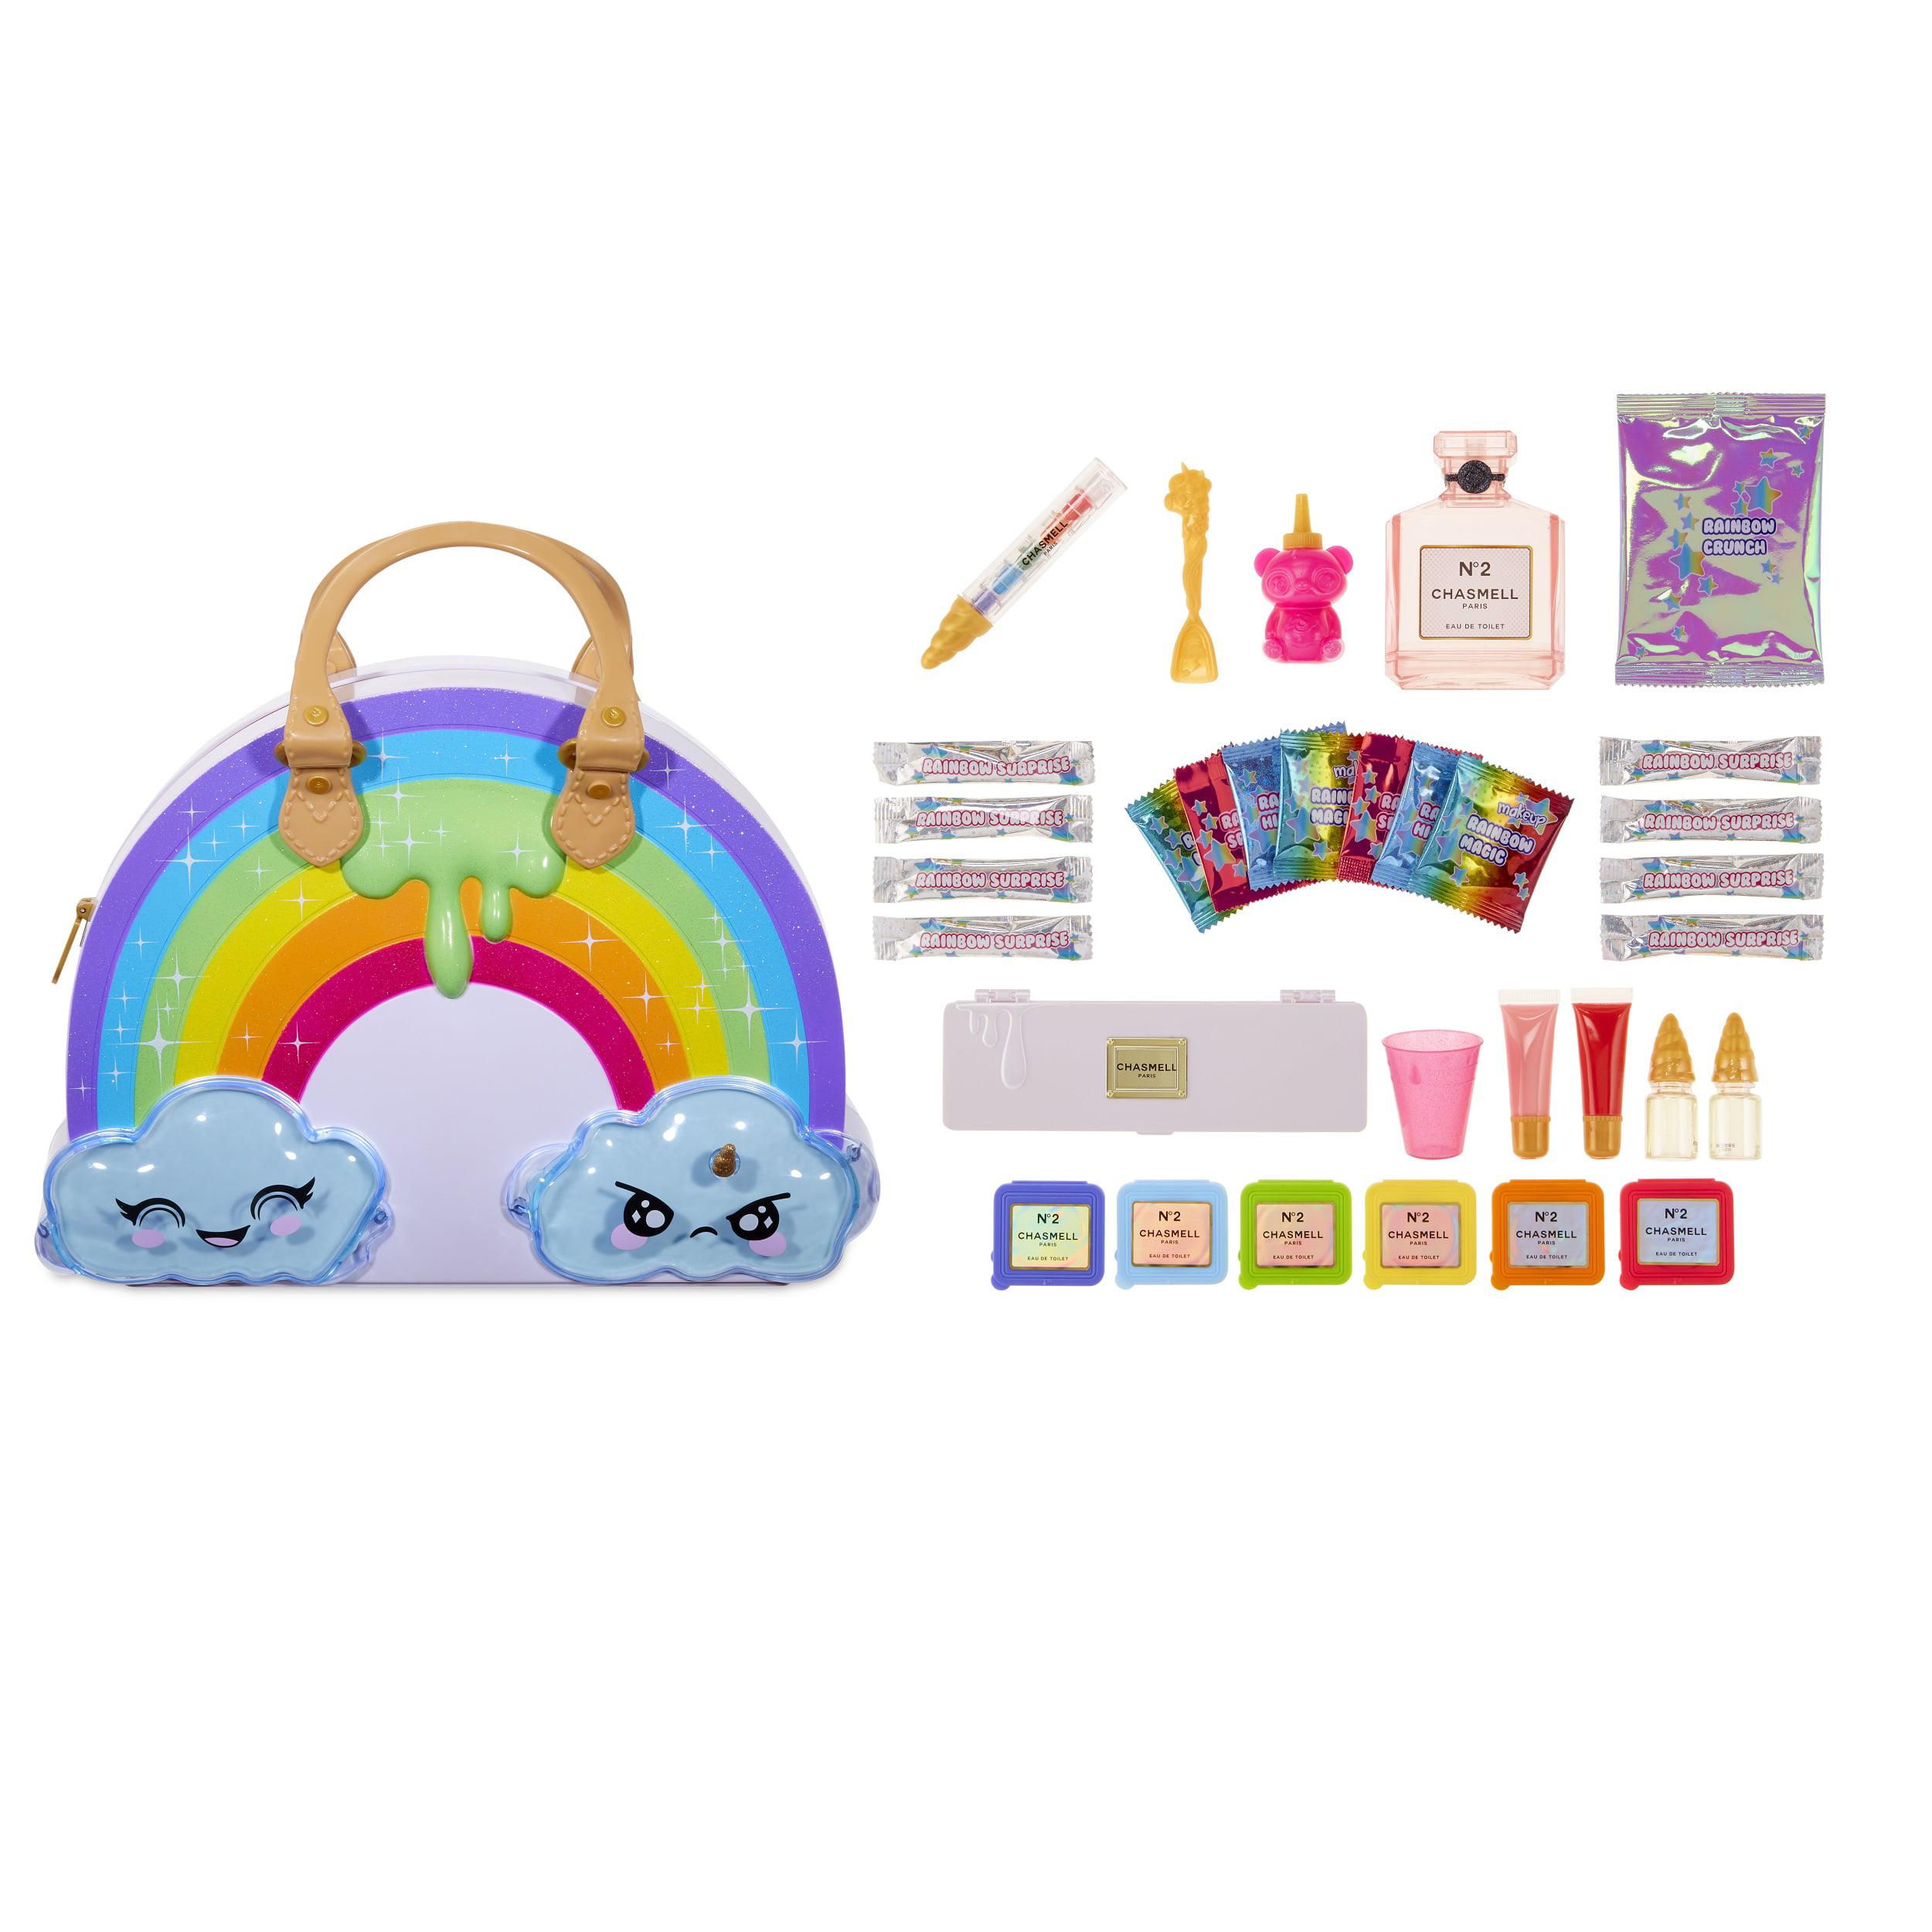 Poopsie Rainbow Surprise Slime Kit with 35+ Make Up & Slime Surprises